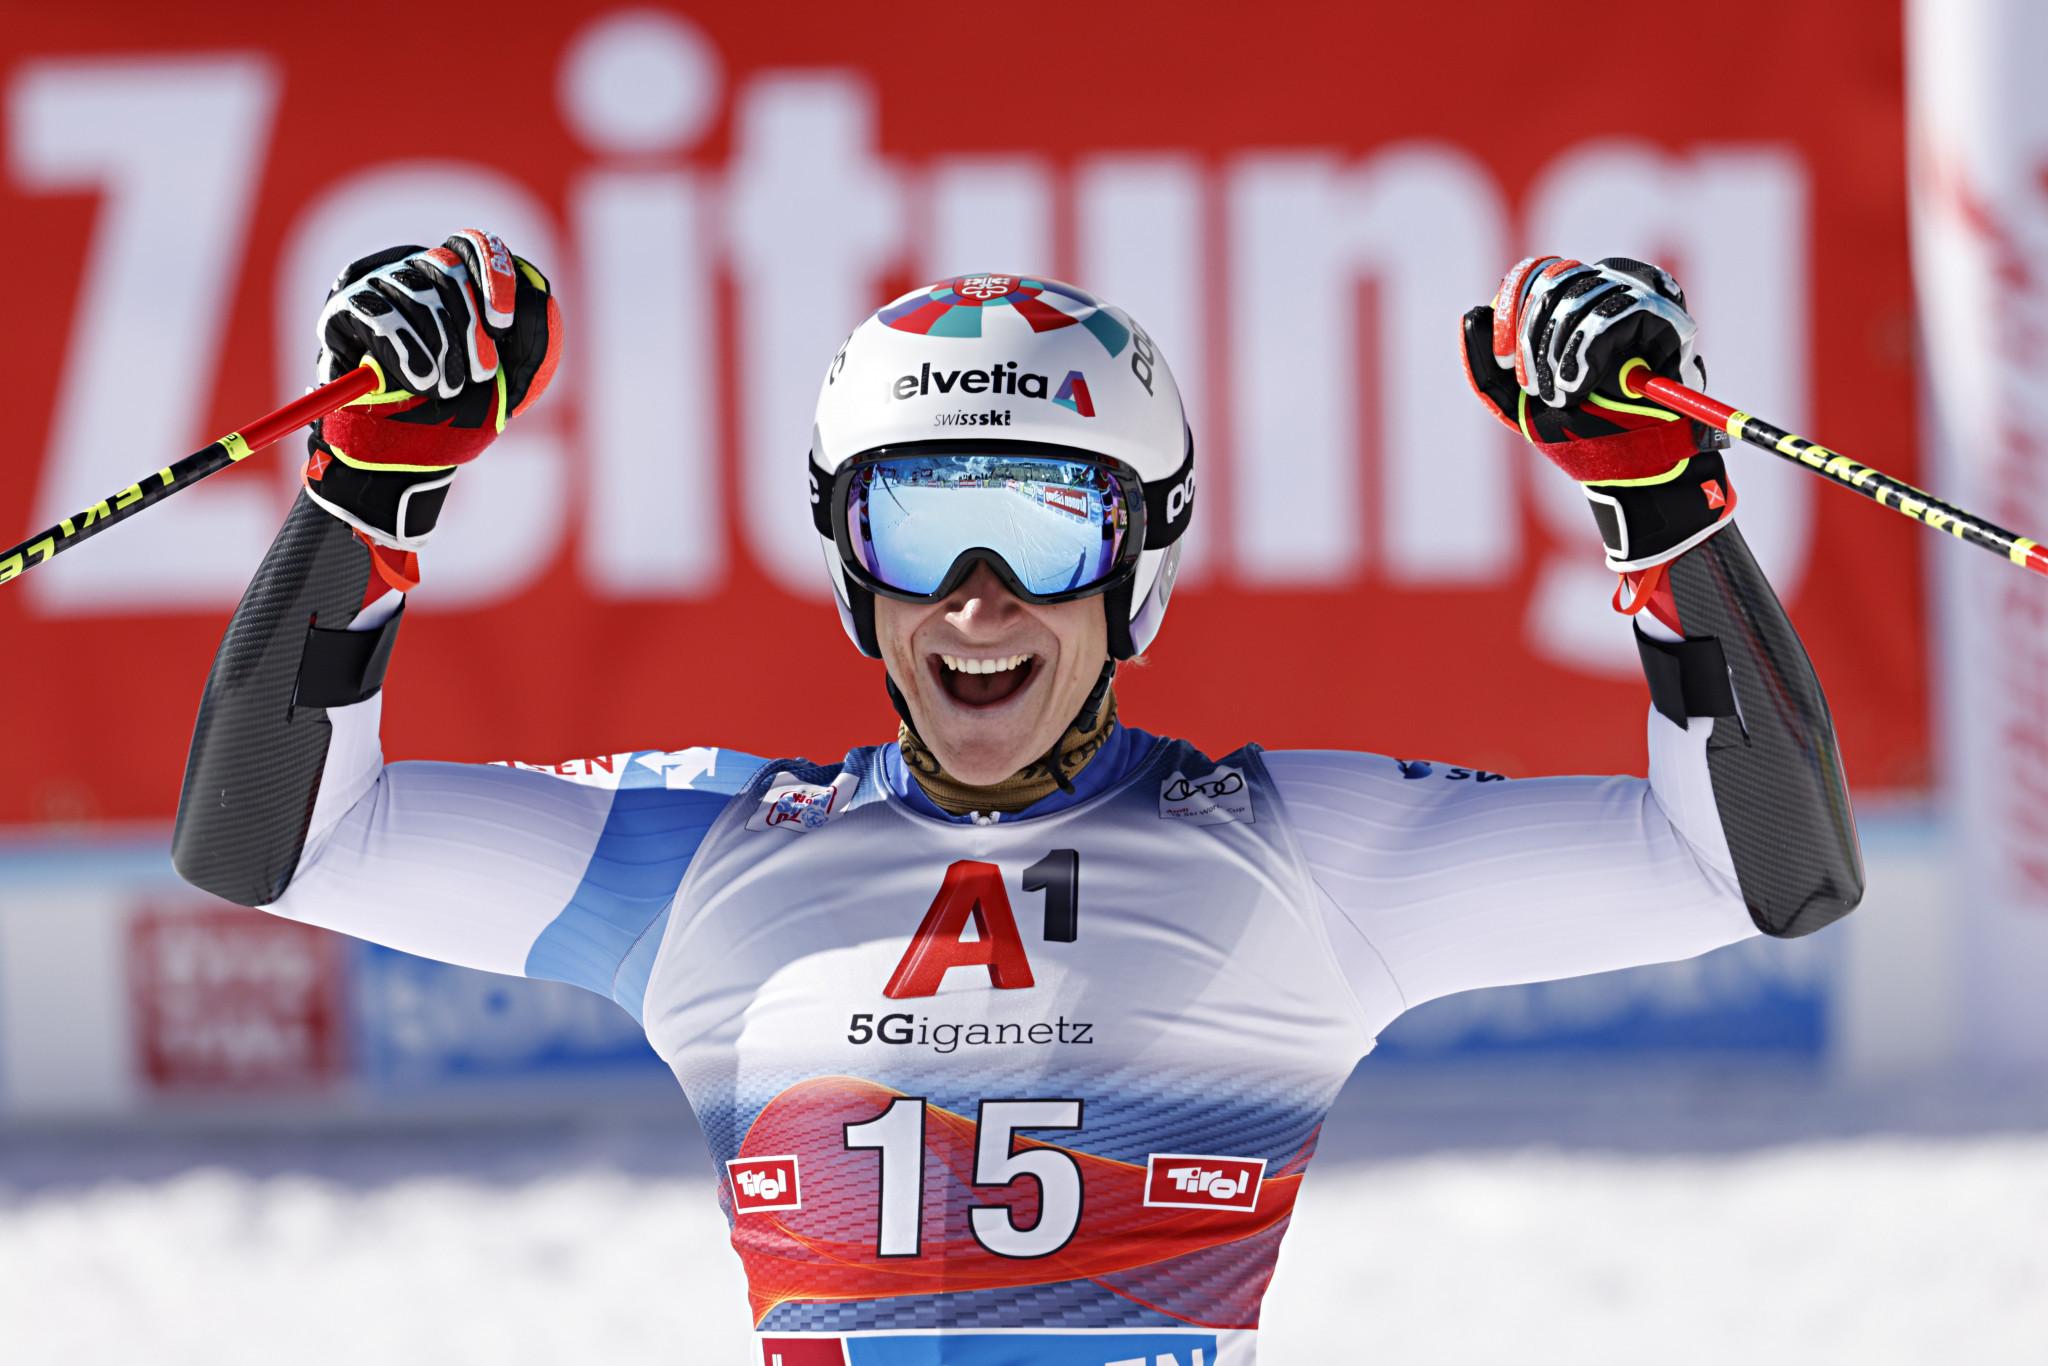 Odermatt eyeing more giant slalom success at FIS Alpine Ski World Cup leg in Santa Caterina